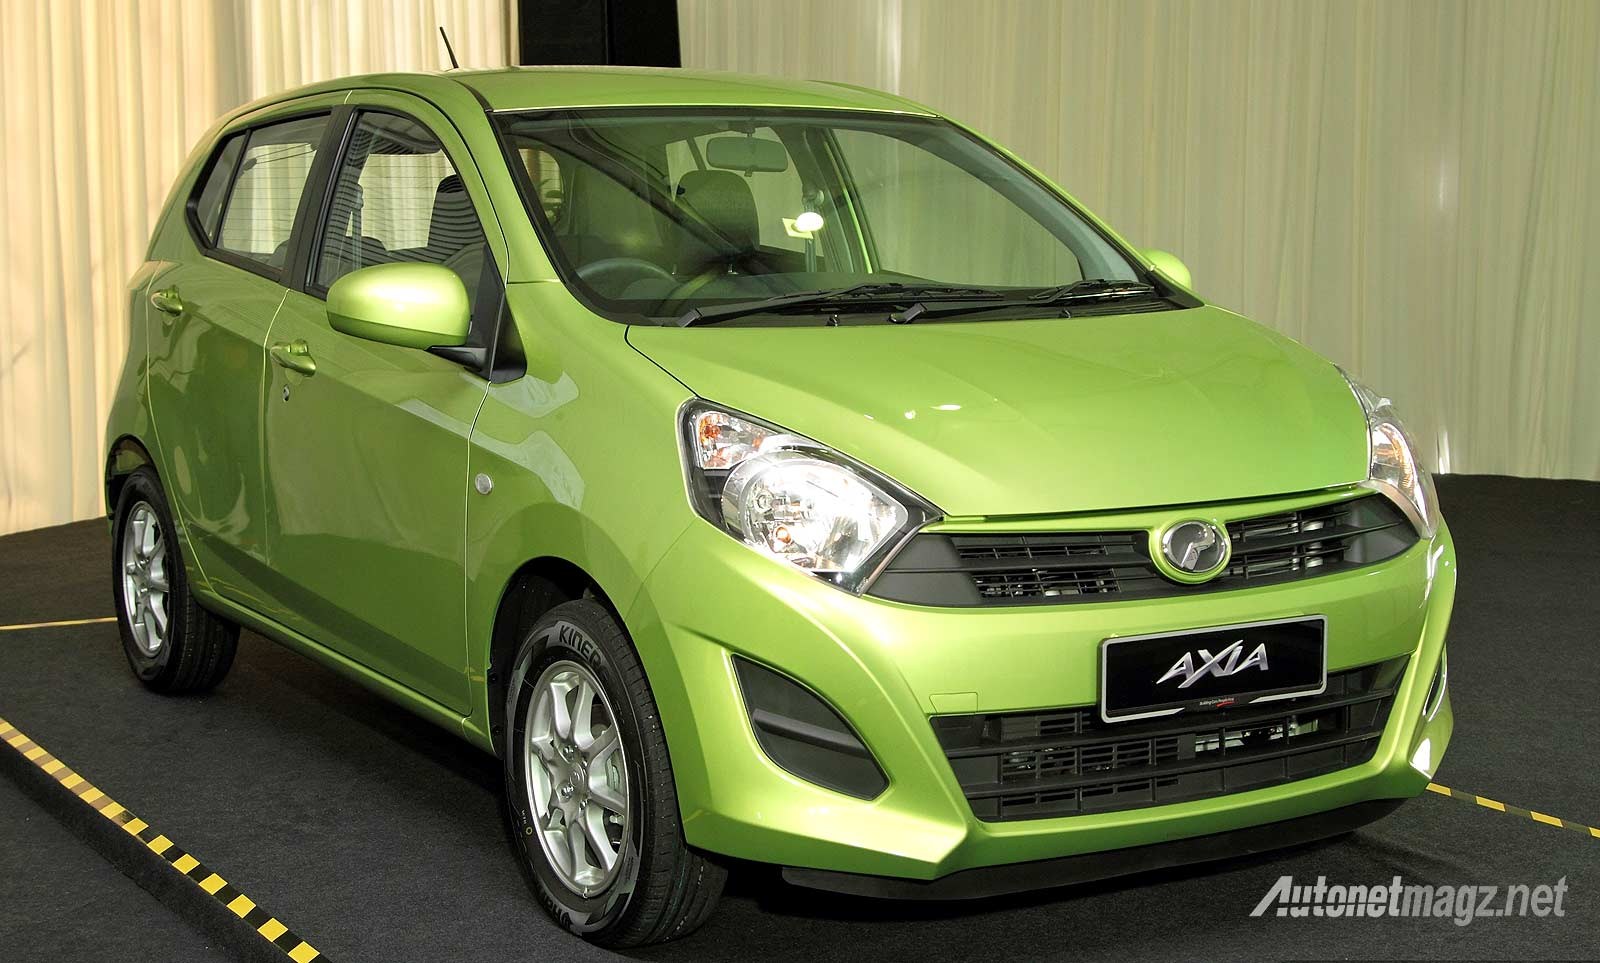 Kembaran Daihatsu Ayla Toyota Agya Perodua Axia dari Malaysia